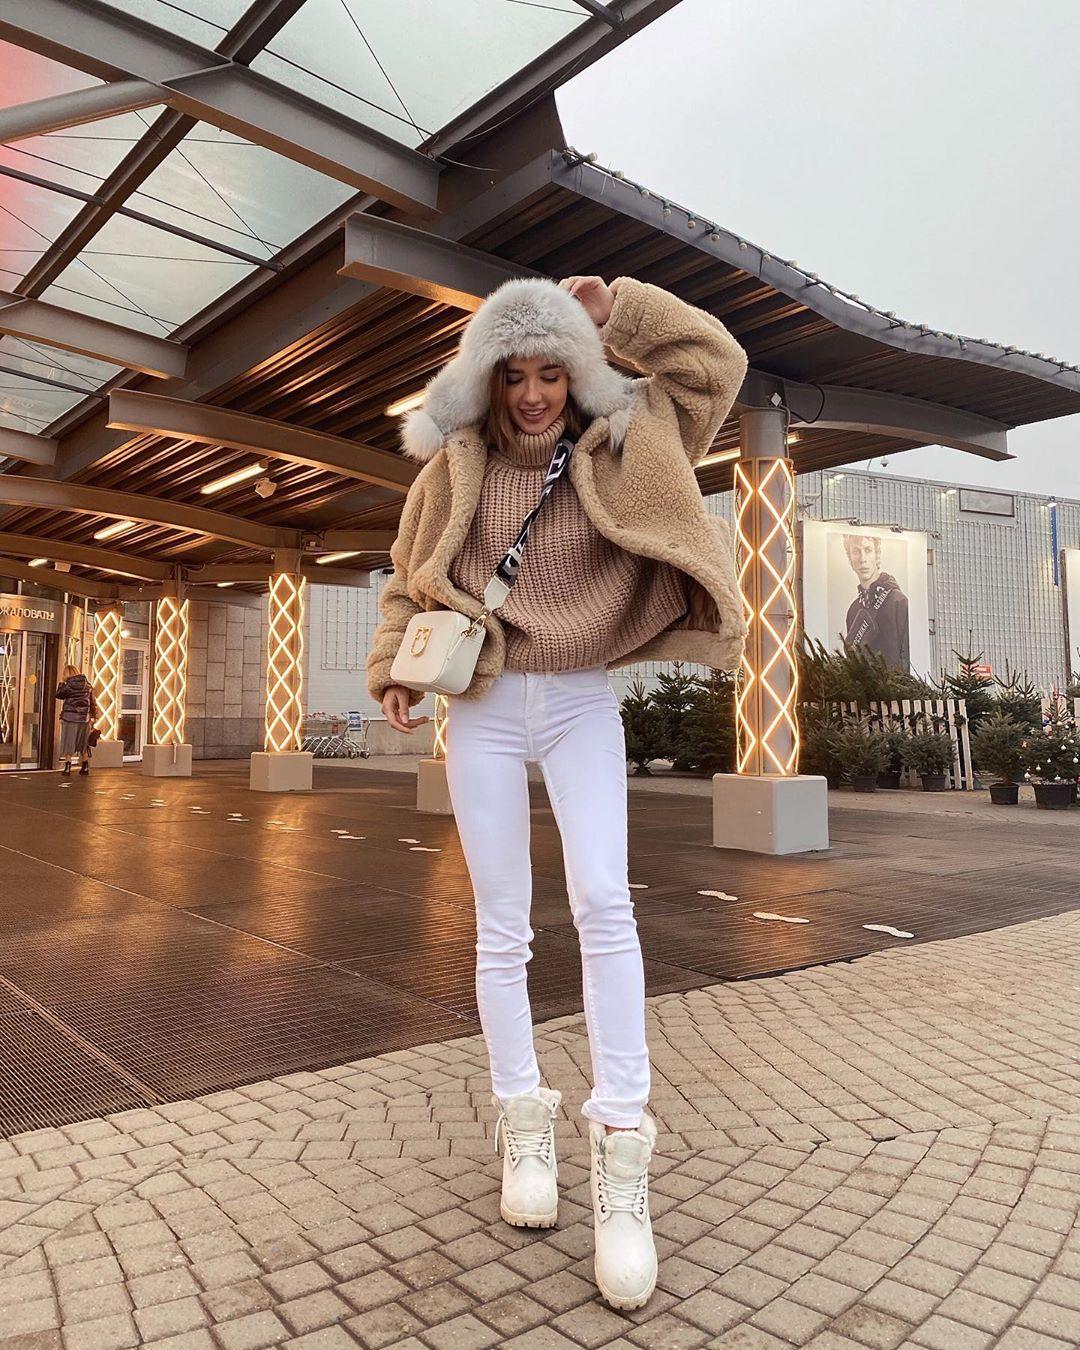 Yekaterina-Mezenova-Wallpapers-Insta-Fit-Bio-6